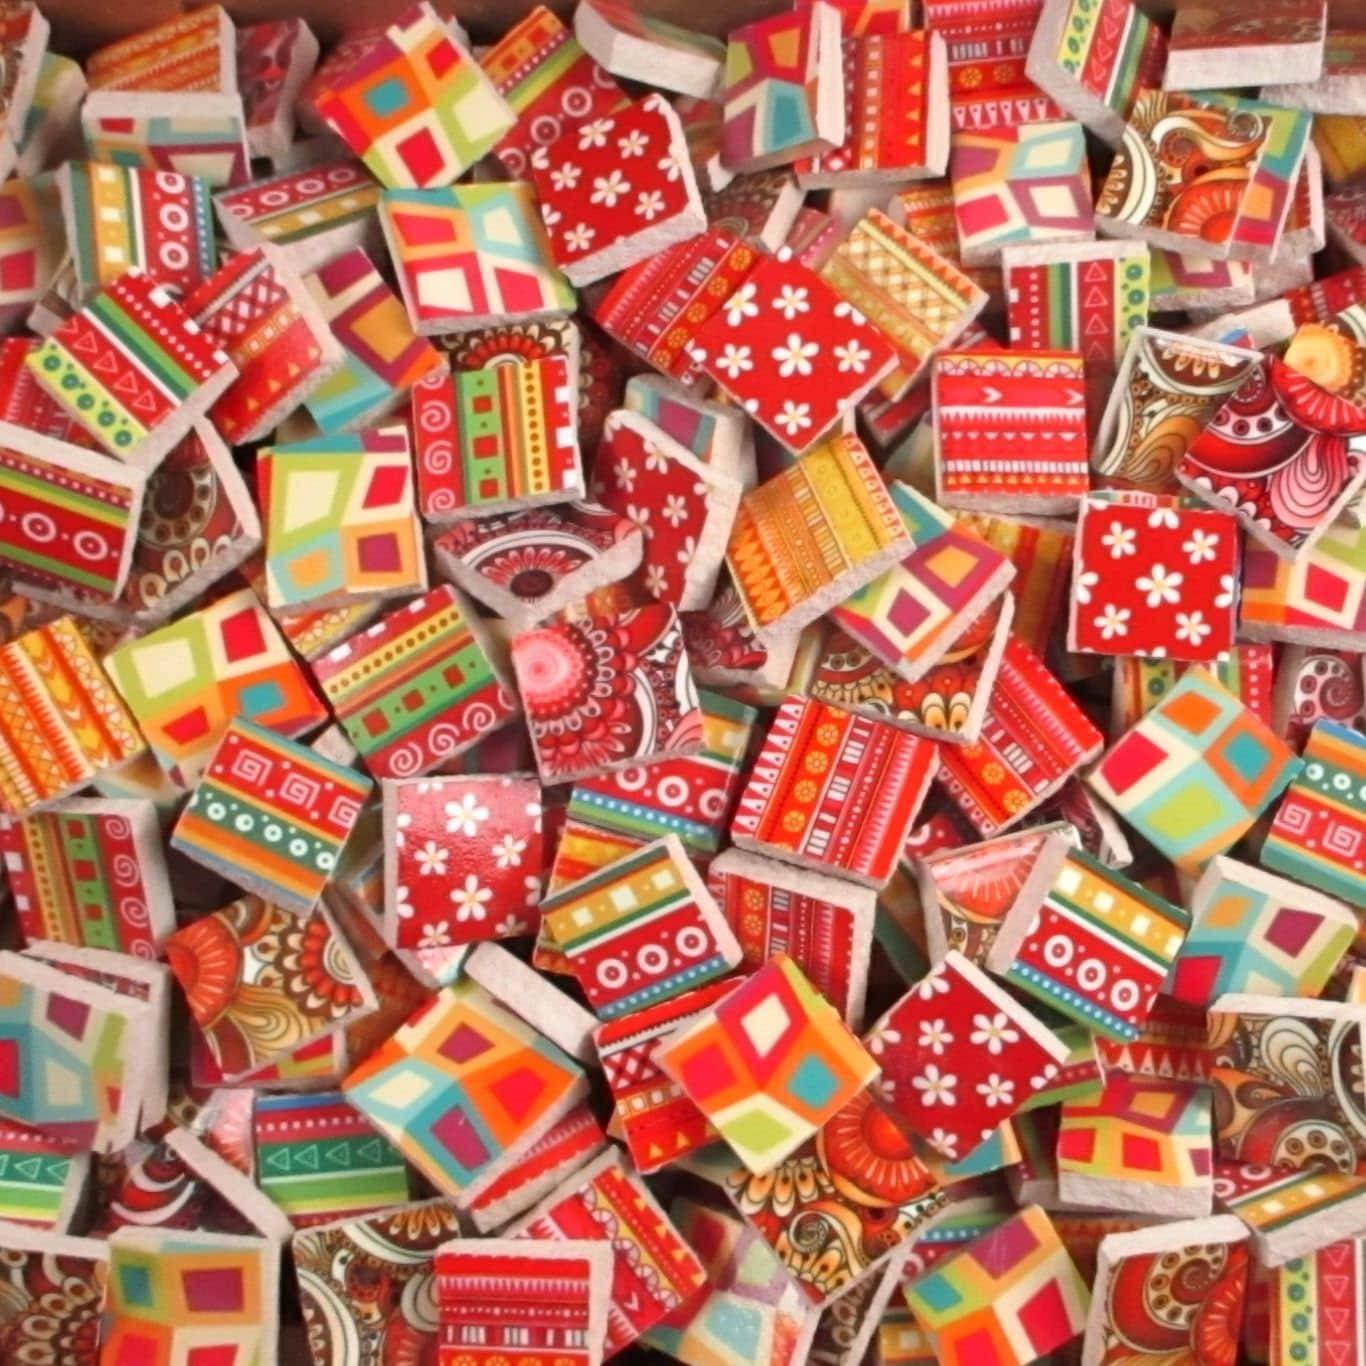 Ceramic mosaic tiles 2 pounds mixed designs patterns red for Craft mosaic tiles bulk